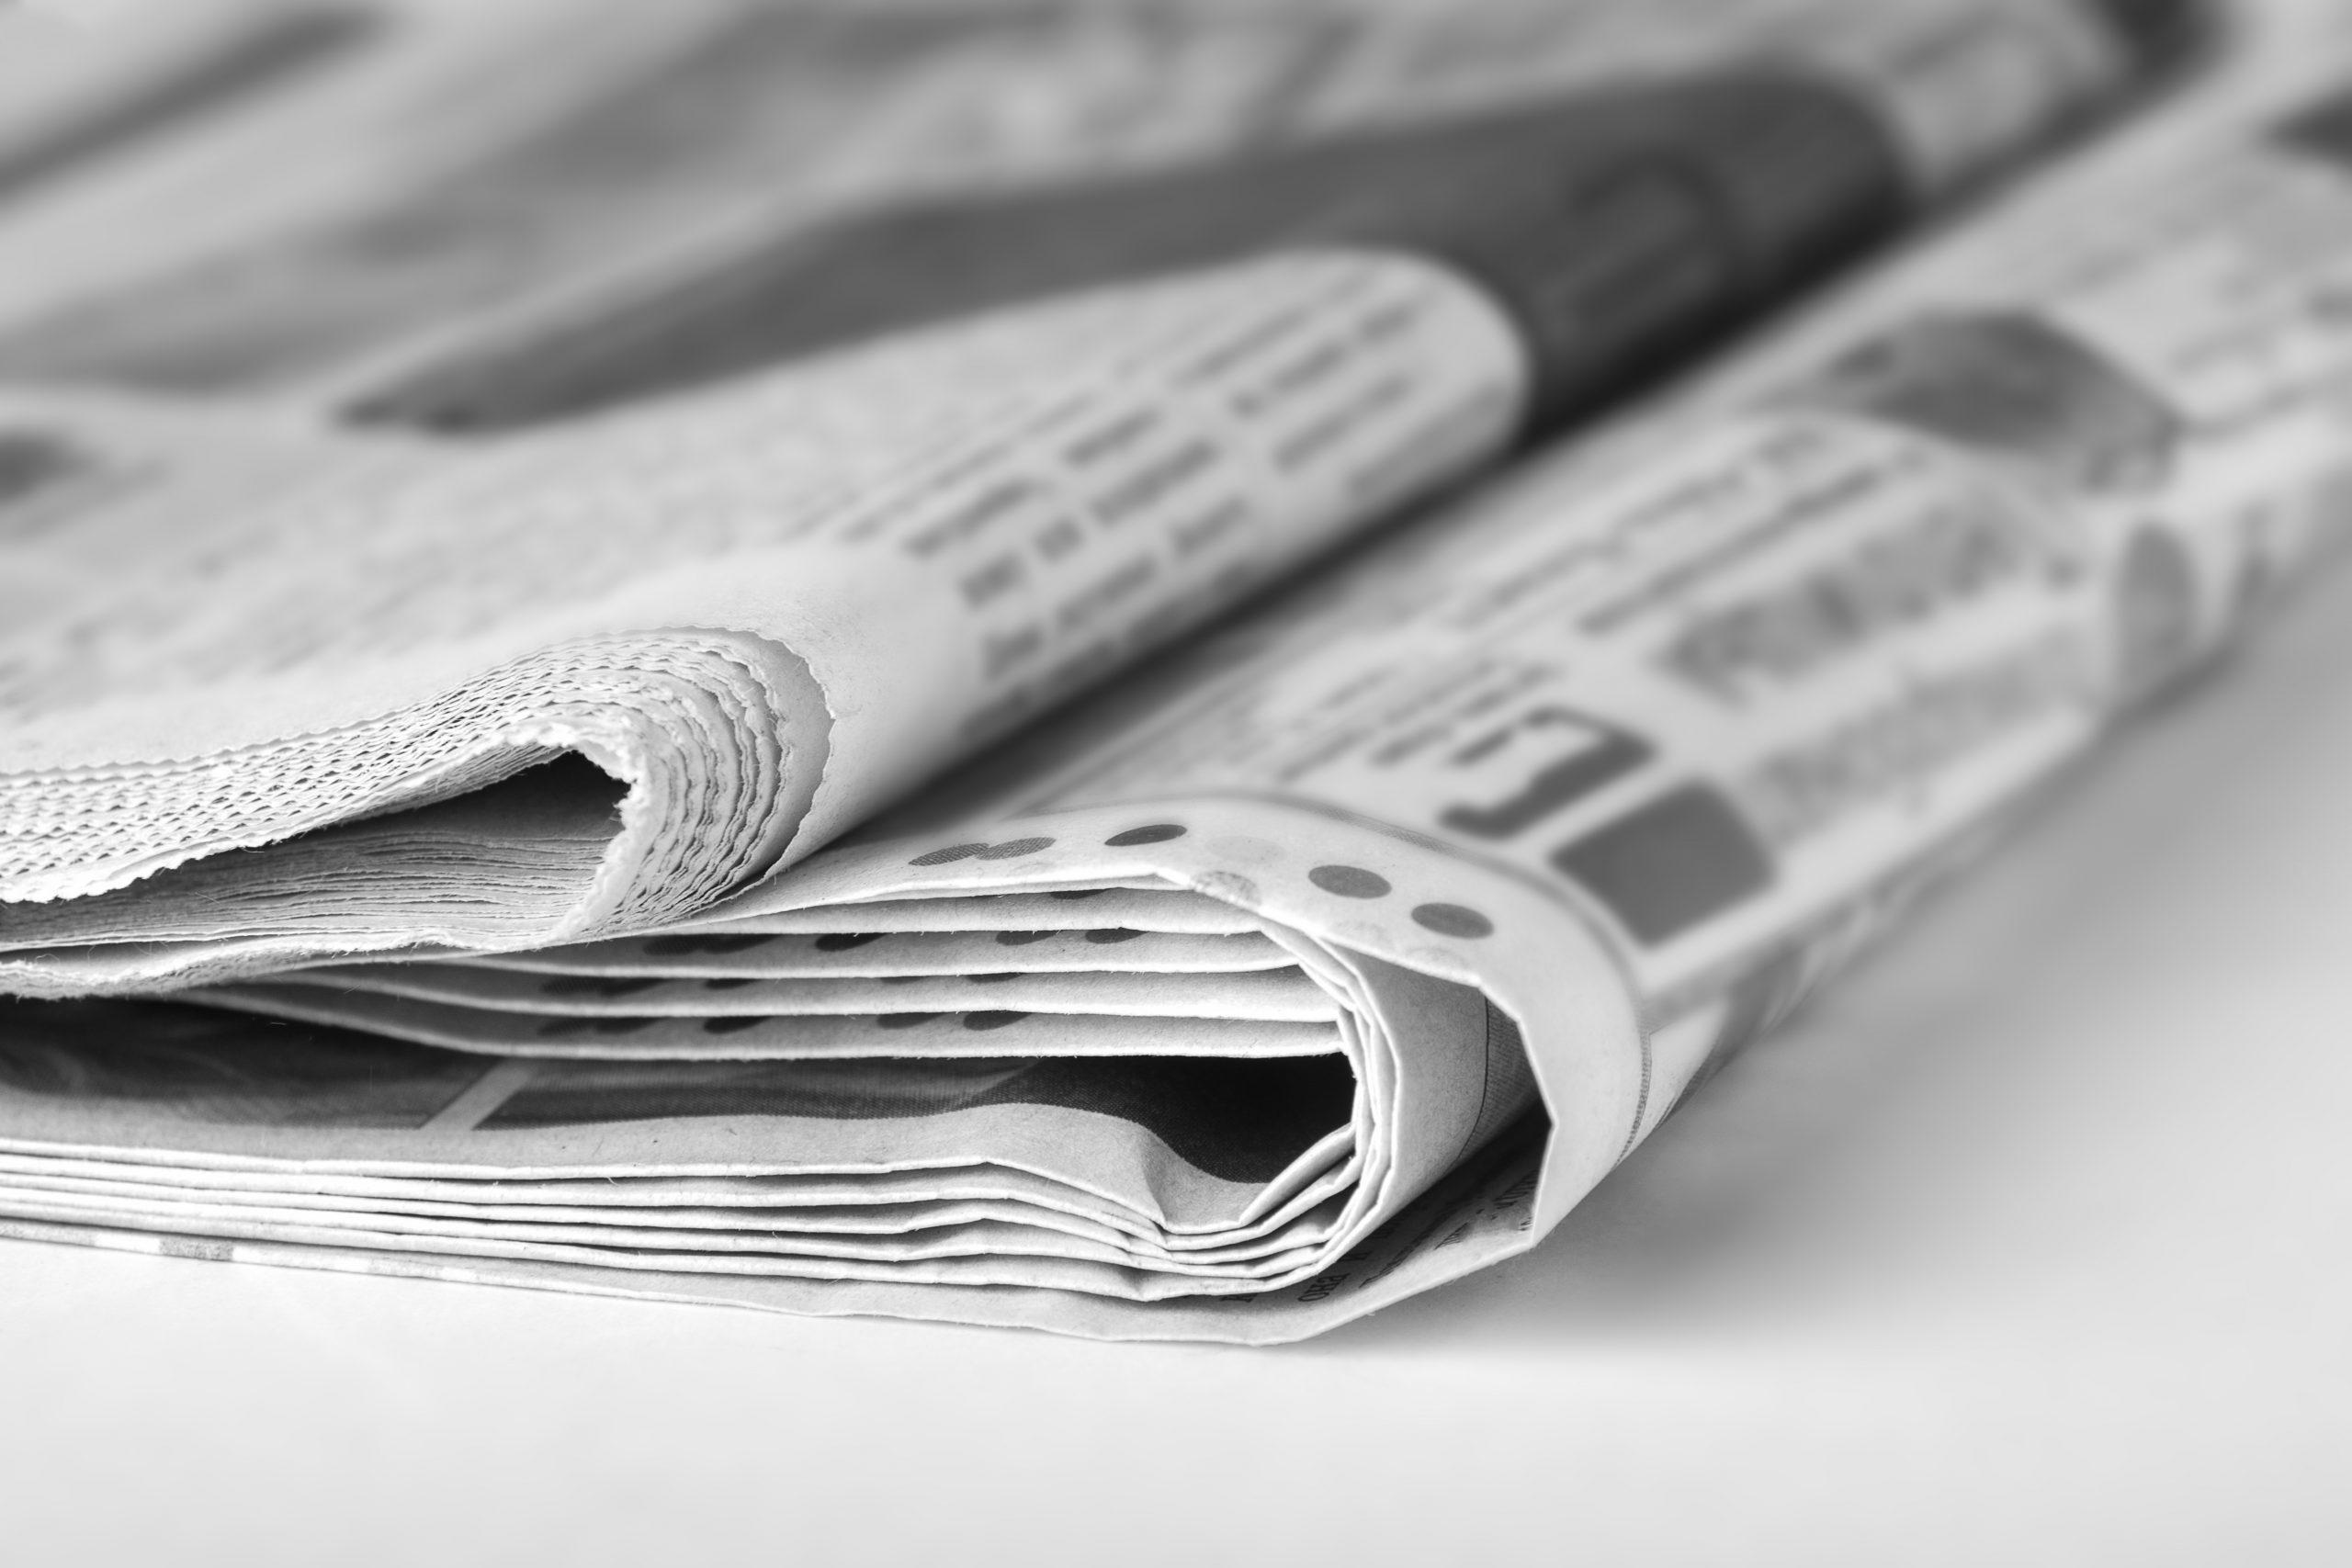 News – Belasco Associates now listed on the National Expert Witness Agency